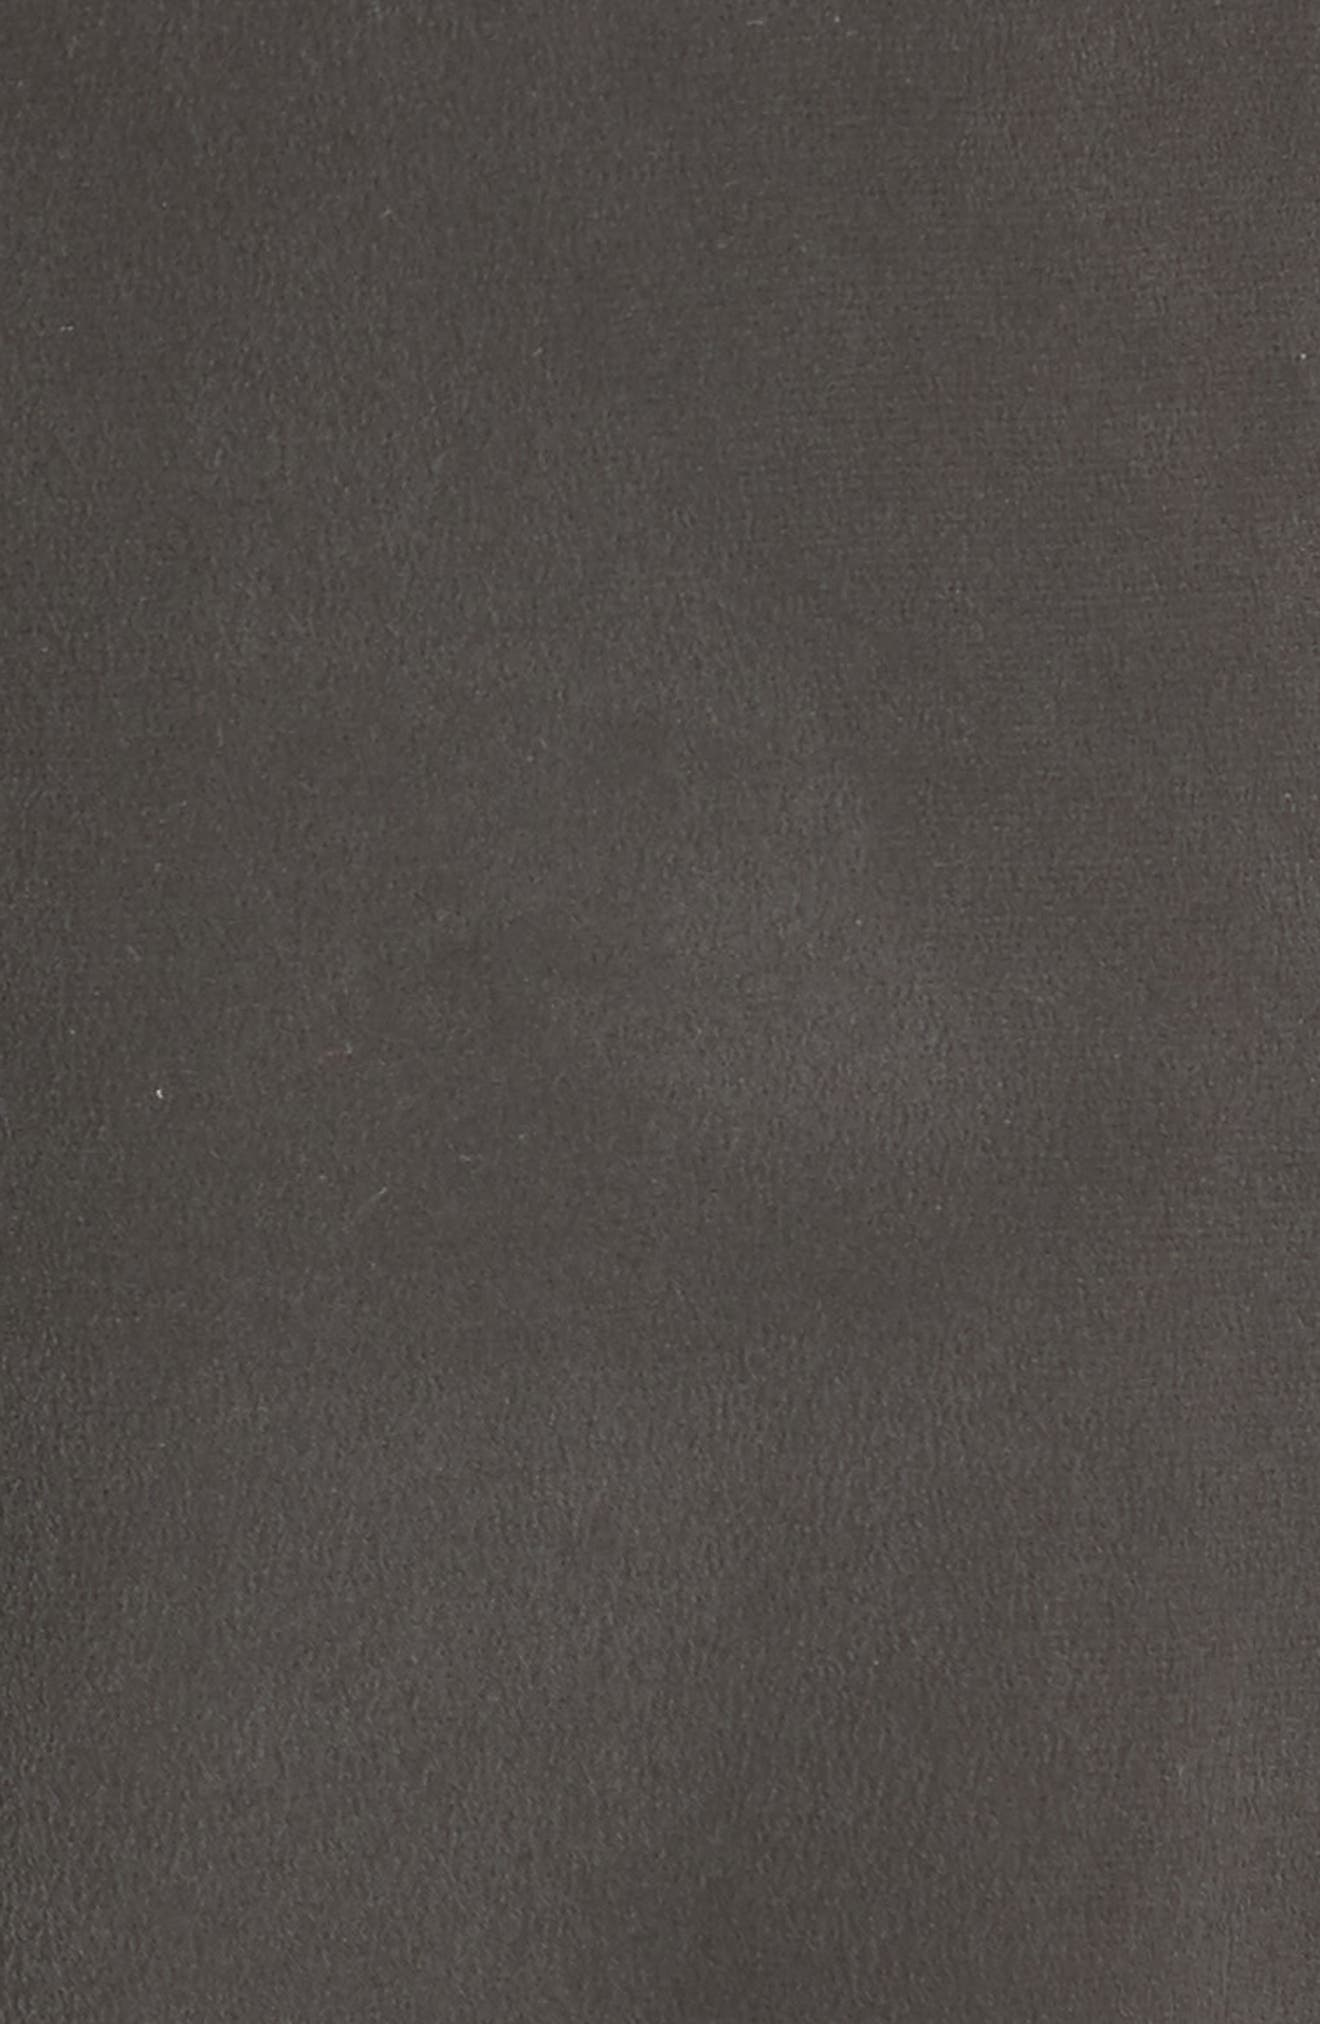 Bevin Silk Crop Cargo Pants,                             Alternate thumbnail 5, color,                             Black